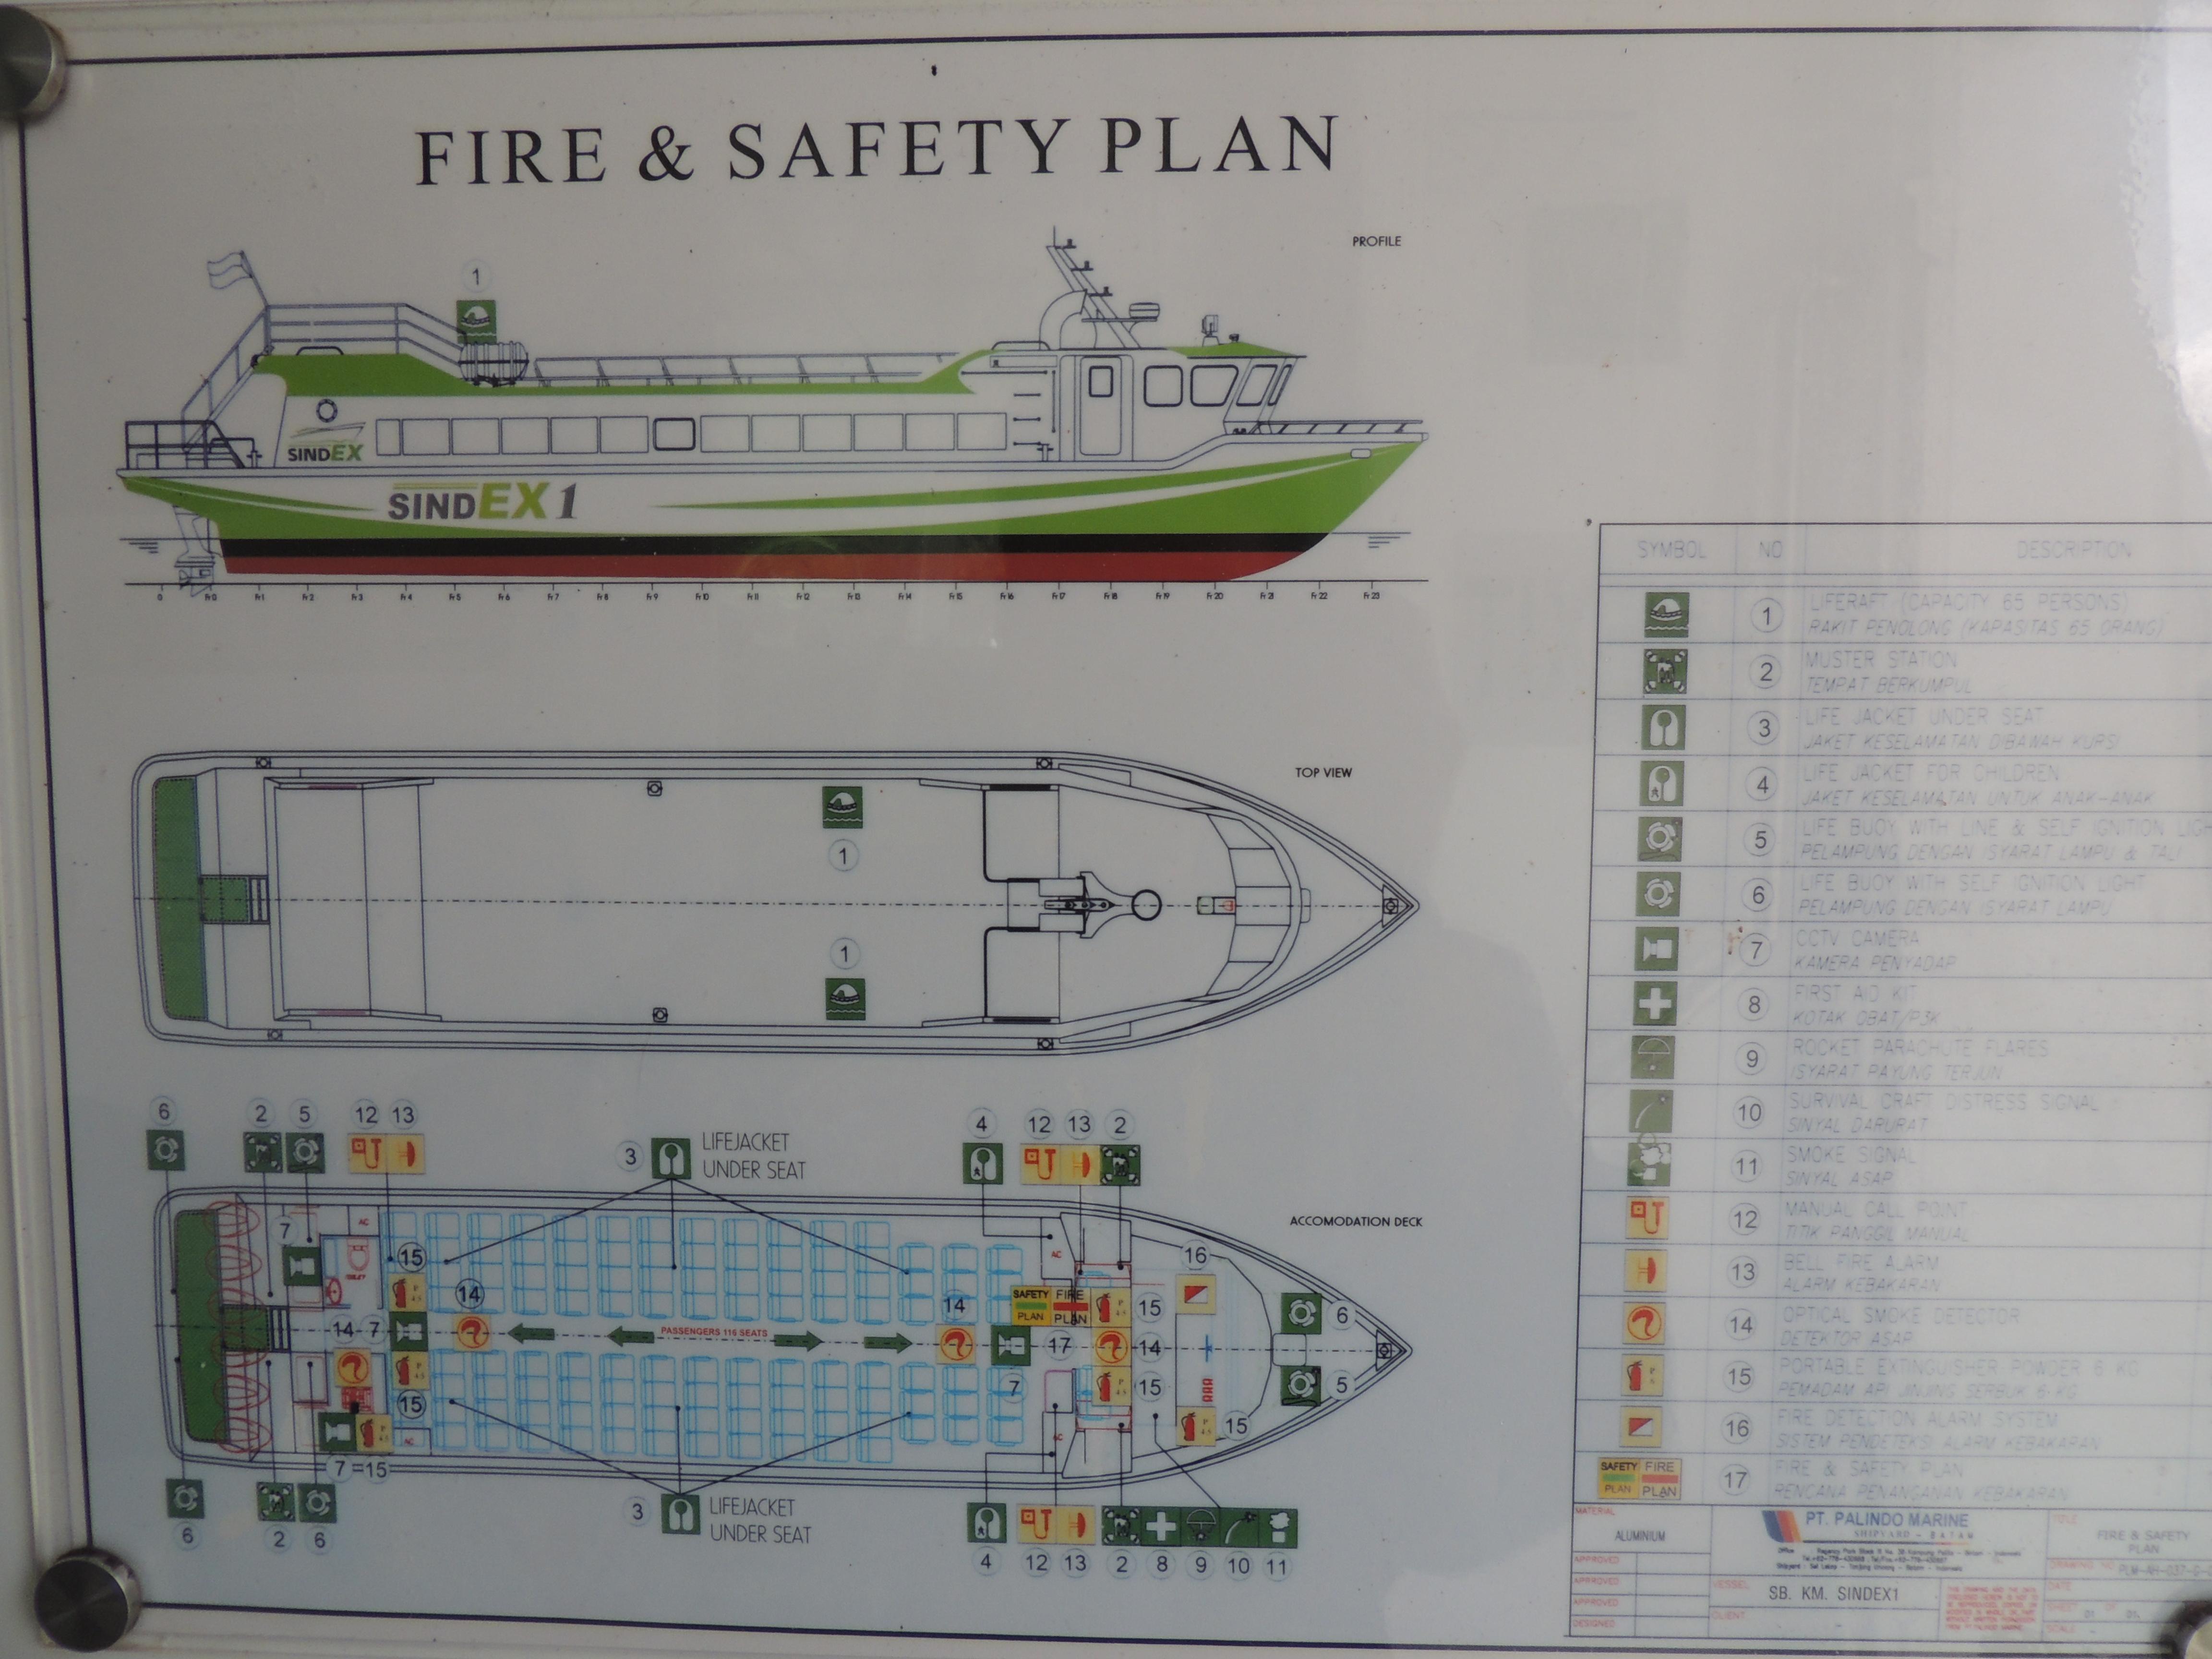 The Advantages of Sindu Express (Sindex) Fast Boat